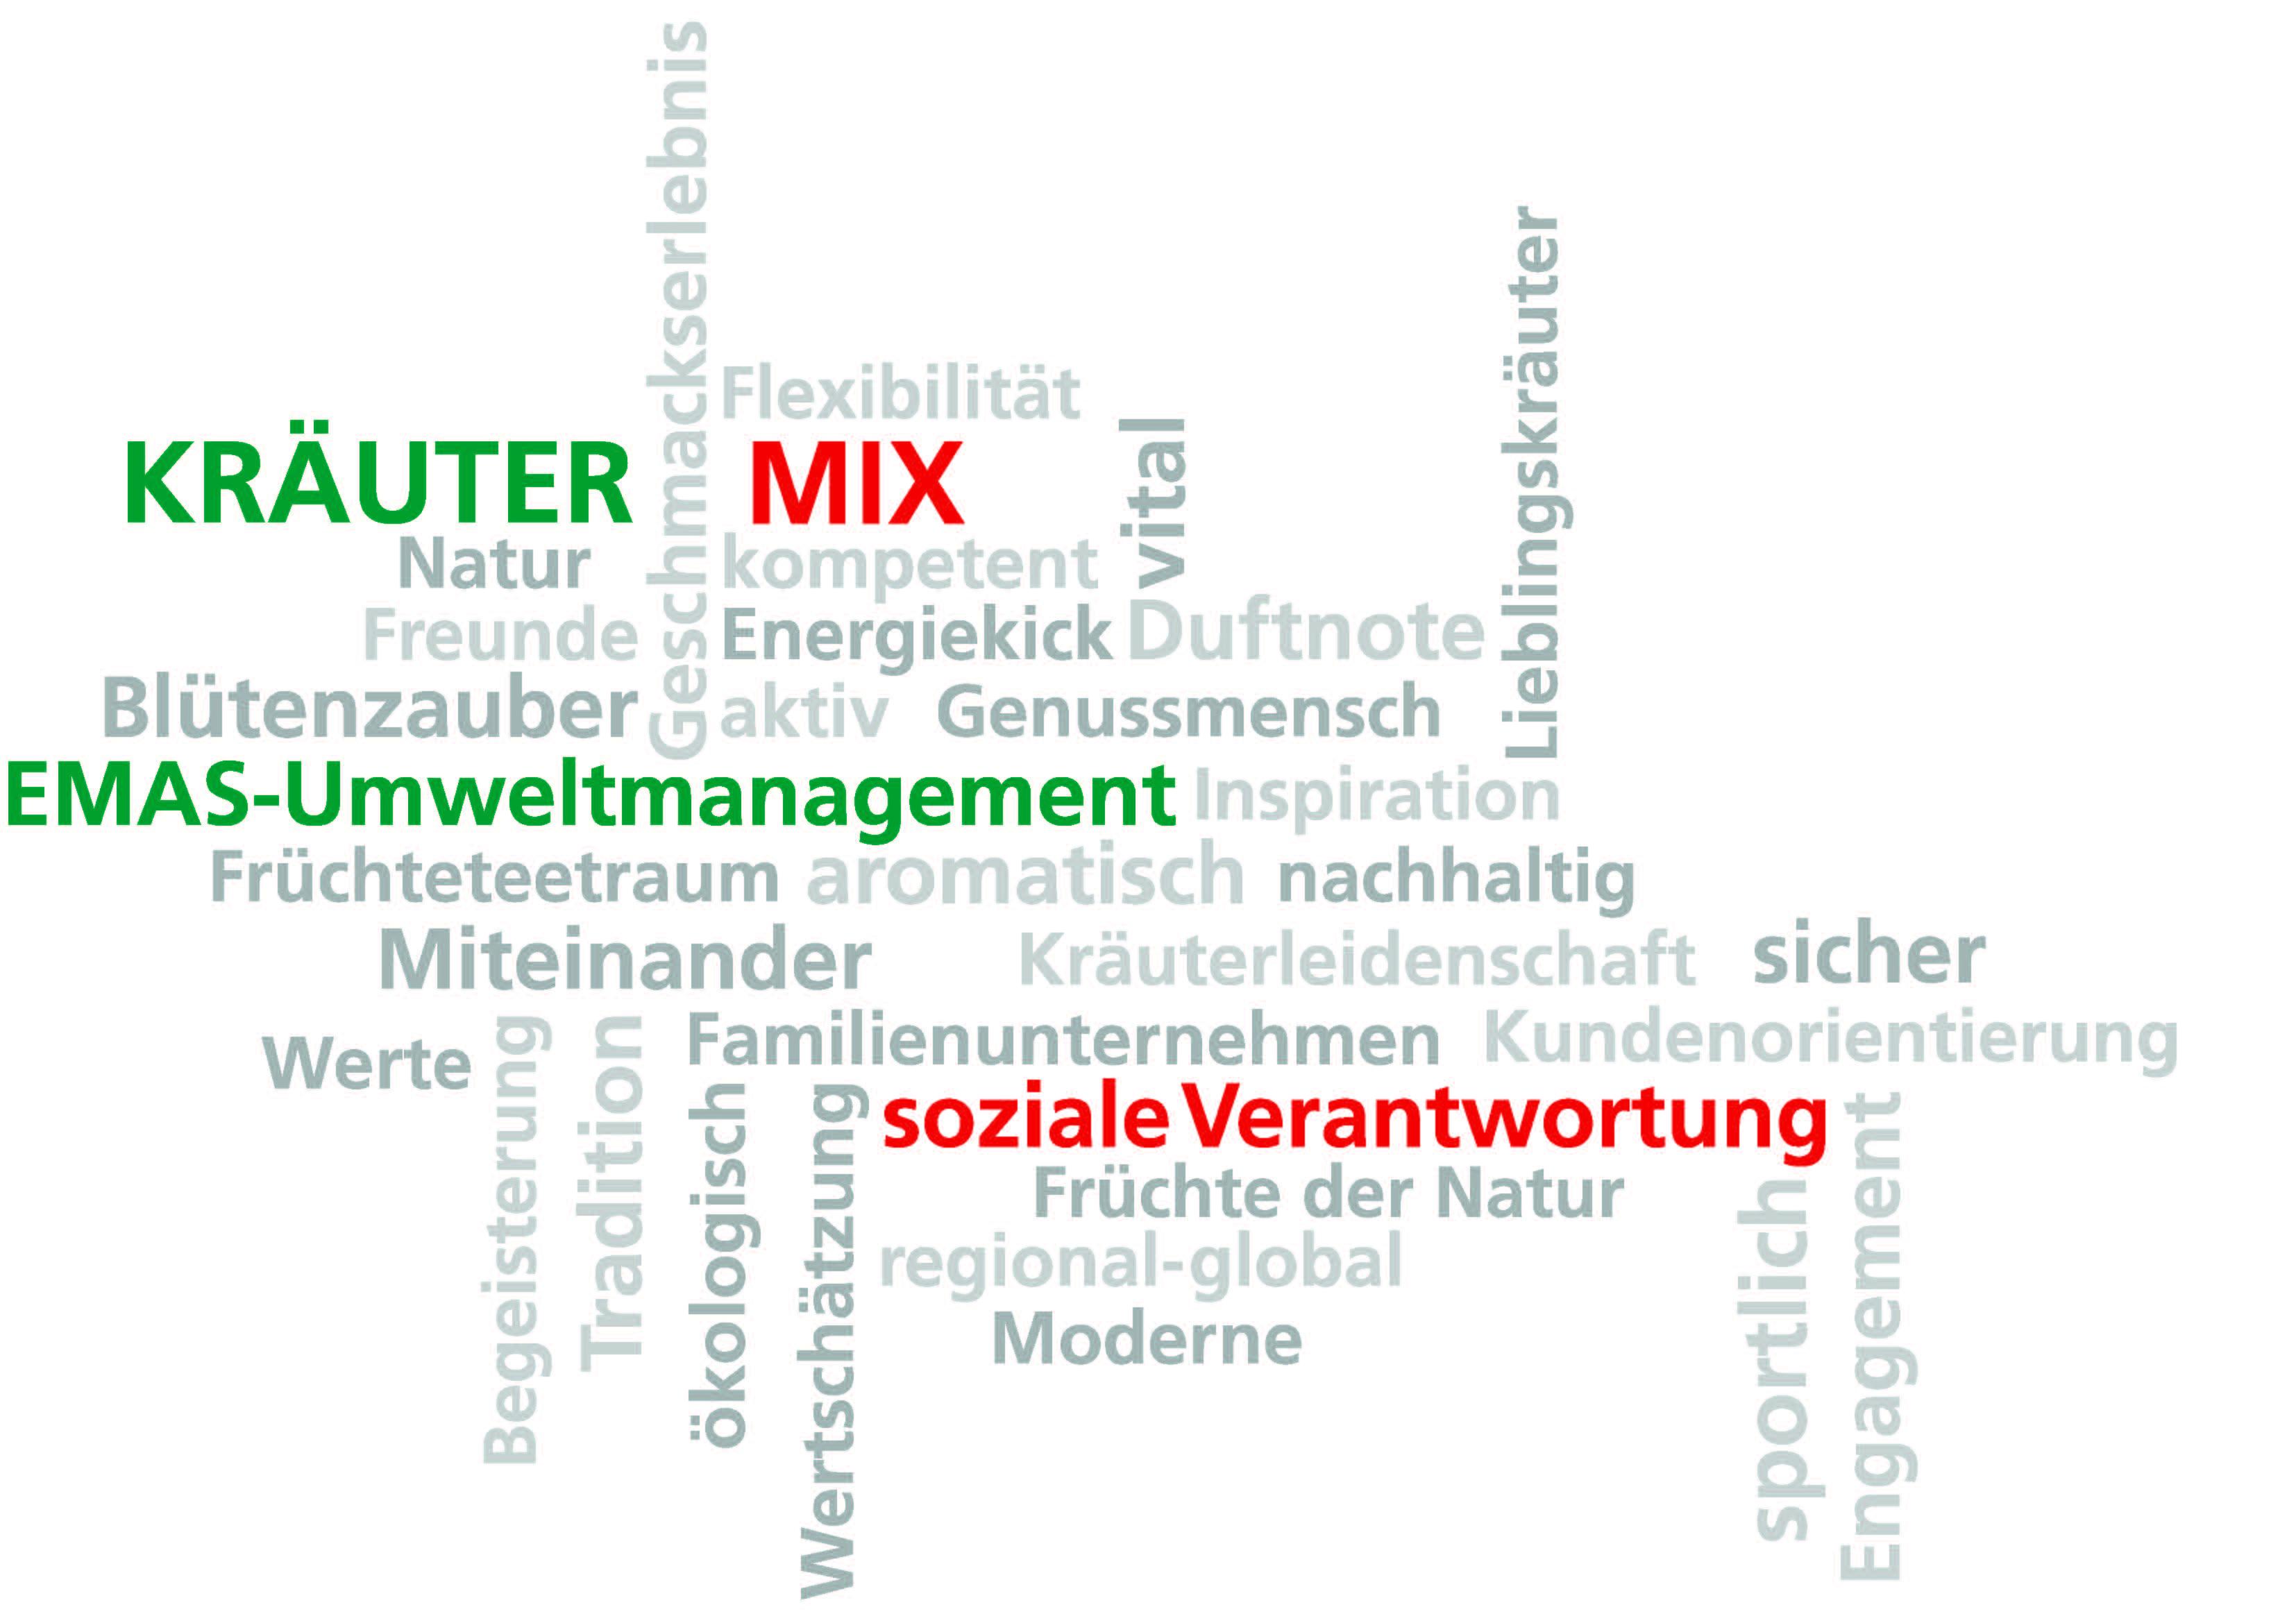 Kräuter Mix als Arbeitgeber: Gehalt, Karriere, Benefits | kununu